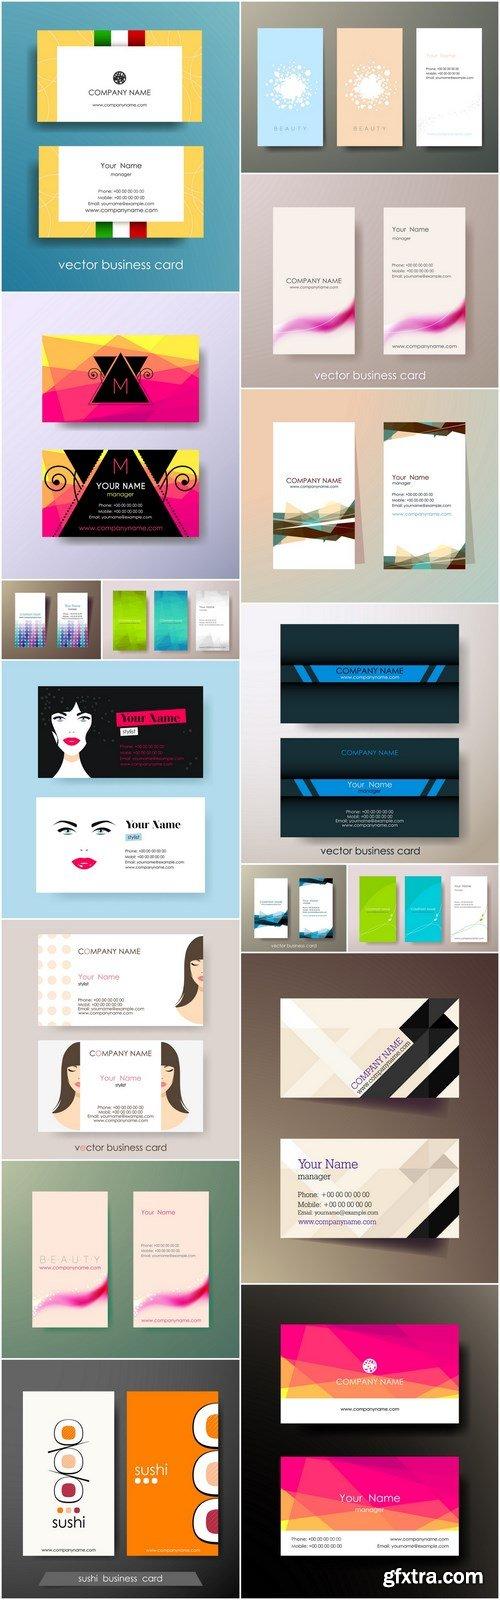 Business Card Design #146 - 16 Vector